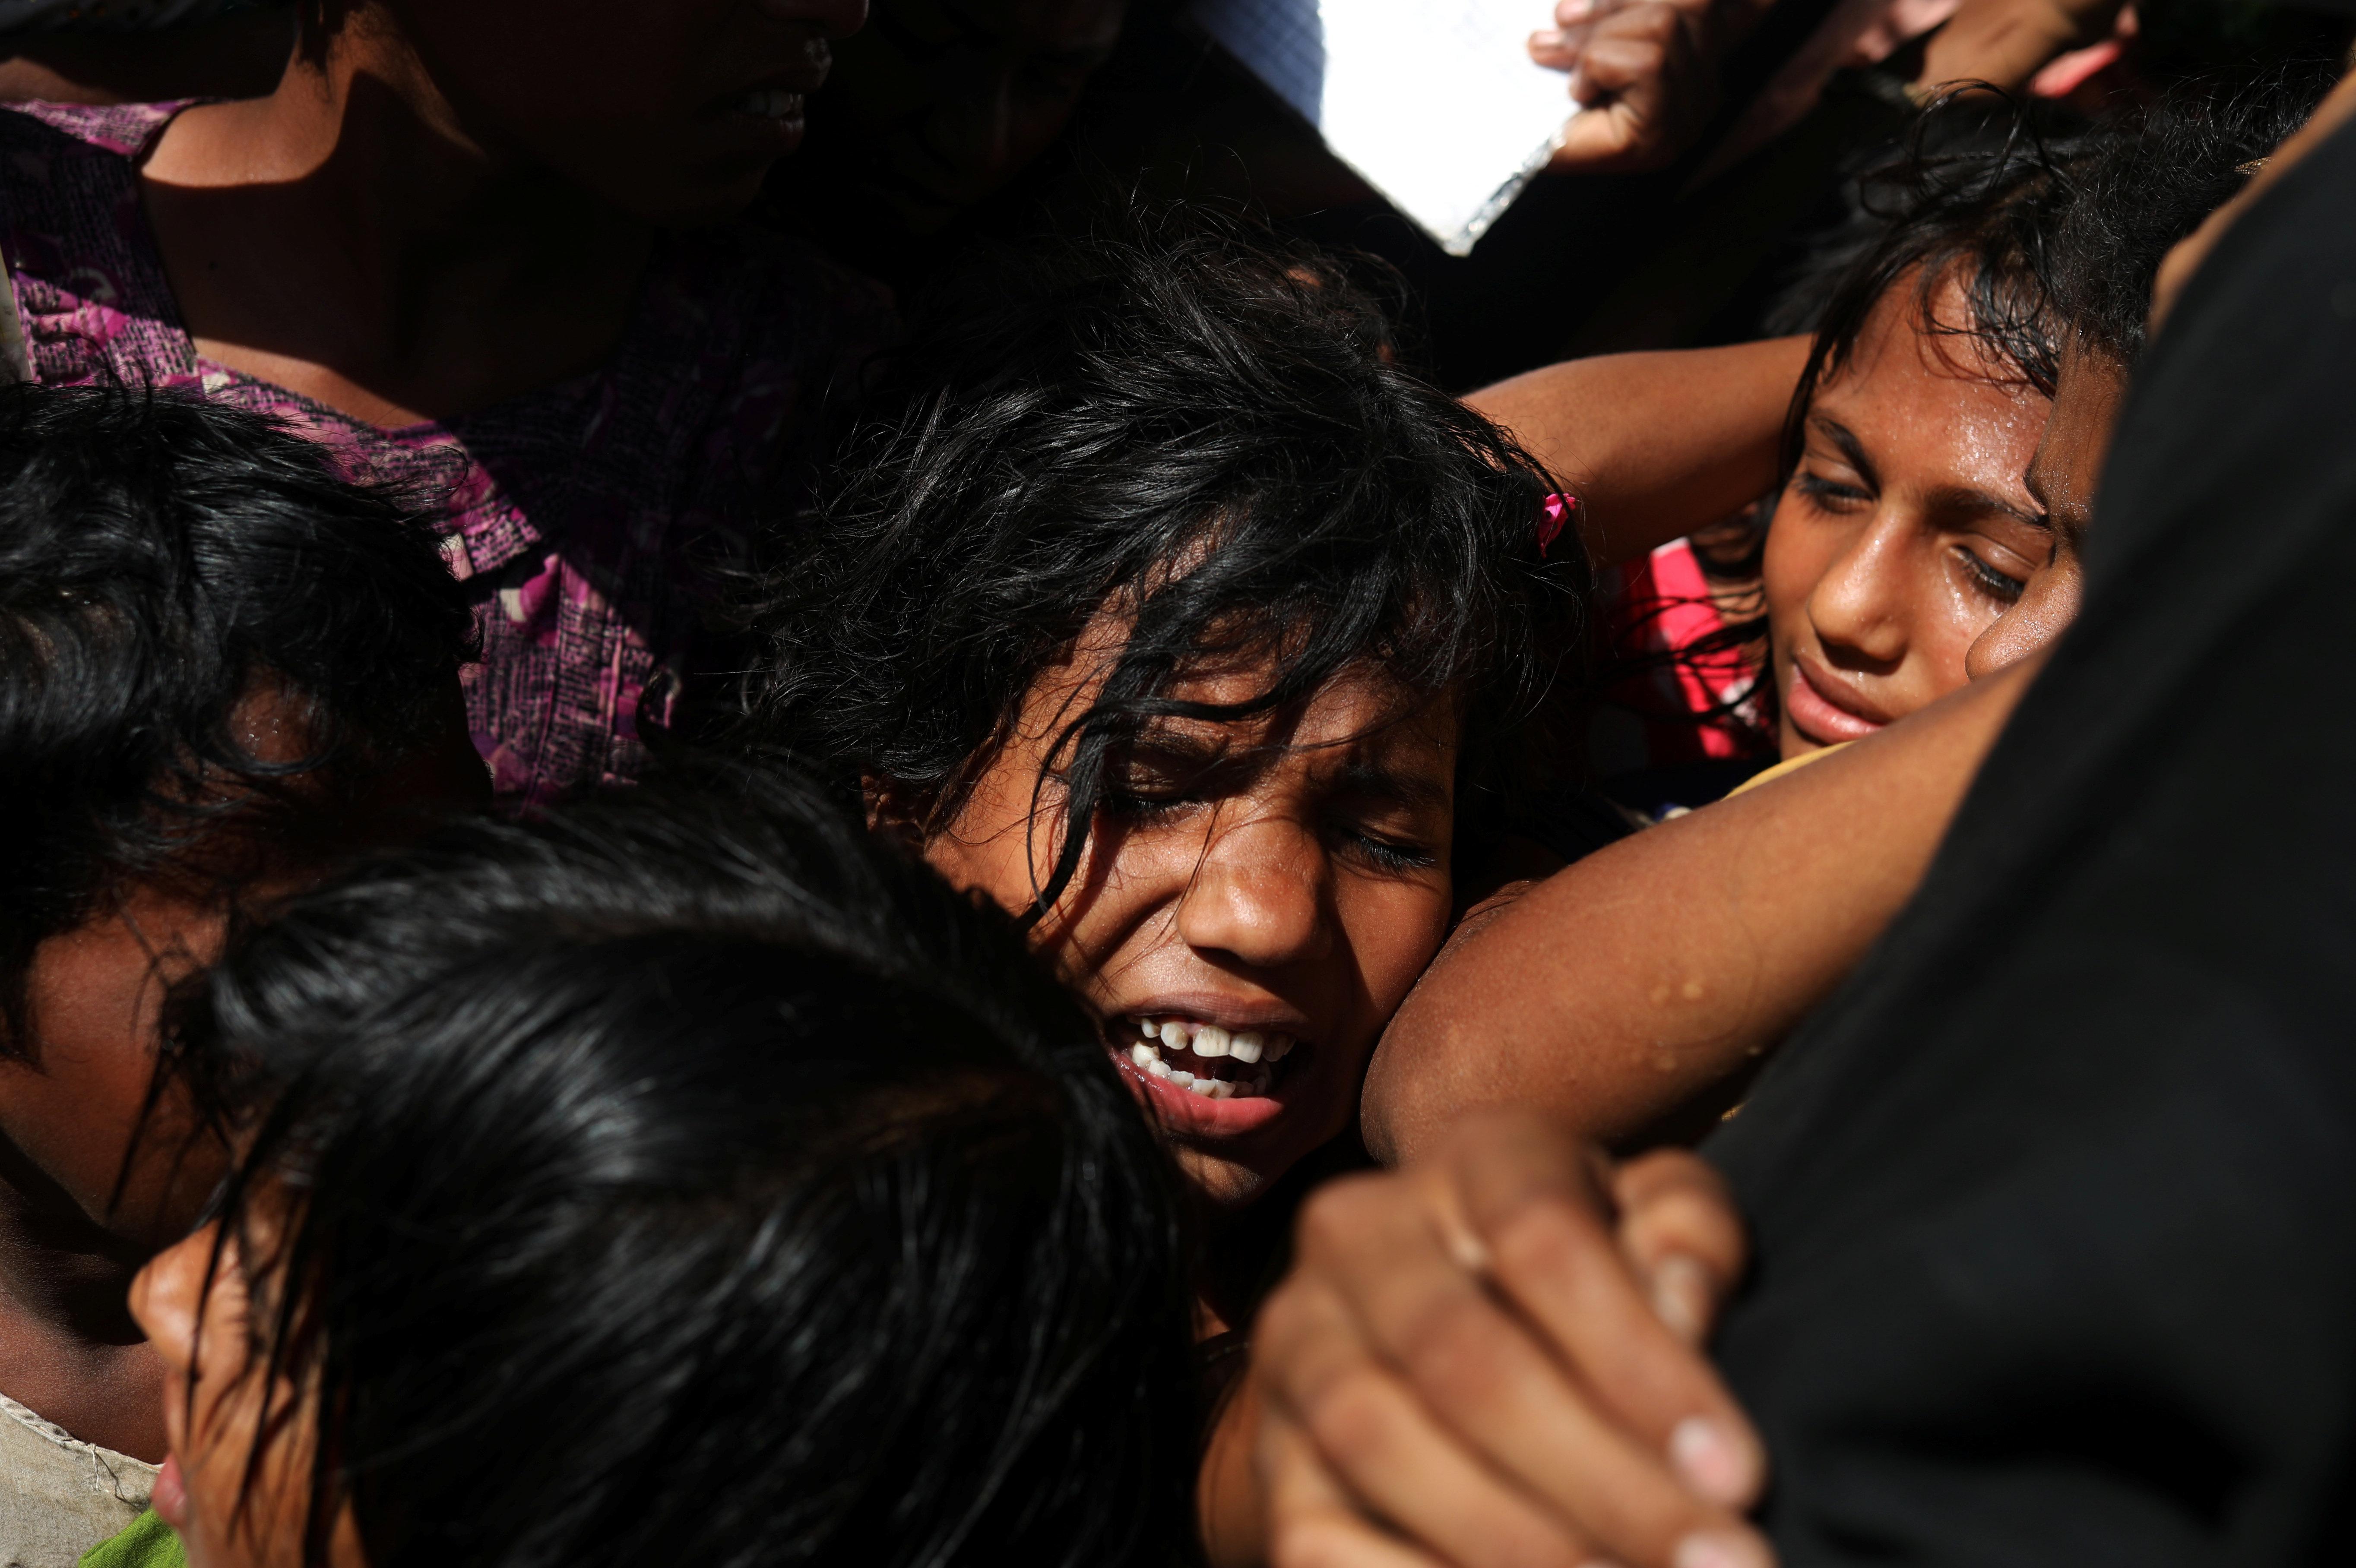 Reuters Reporters Jailed in Myanmar Over Alleged Secret Documents